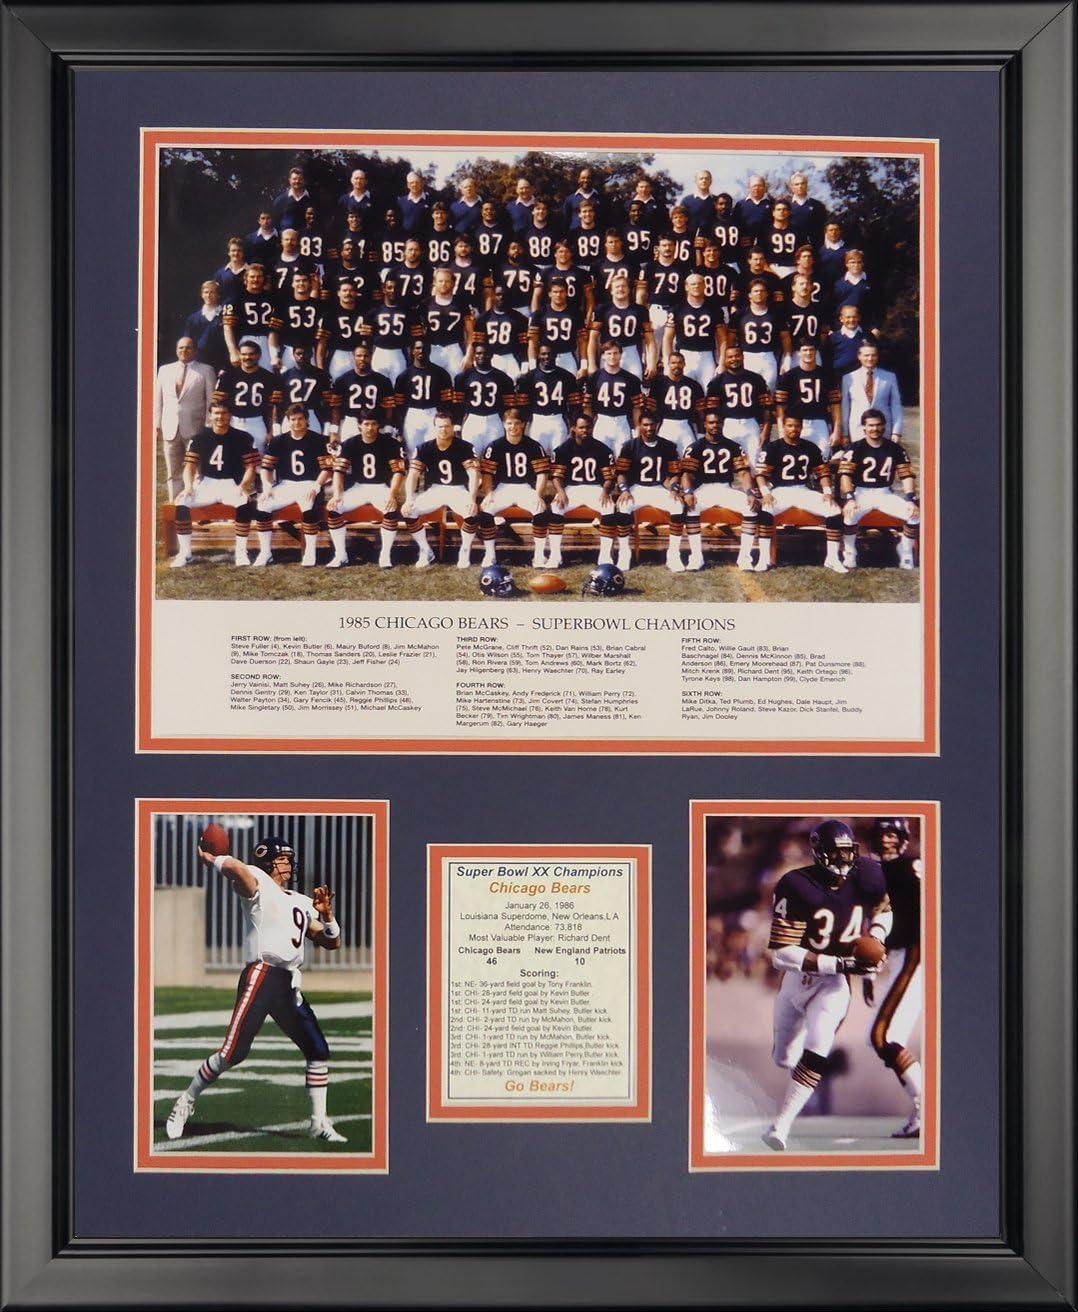 Legends Never Die Chicago Bears - 1985 Bears Framed Photo Collage, 16